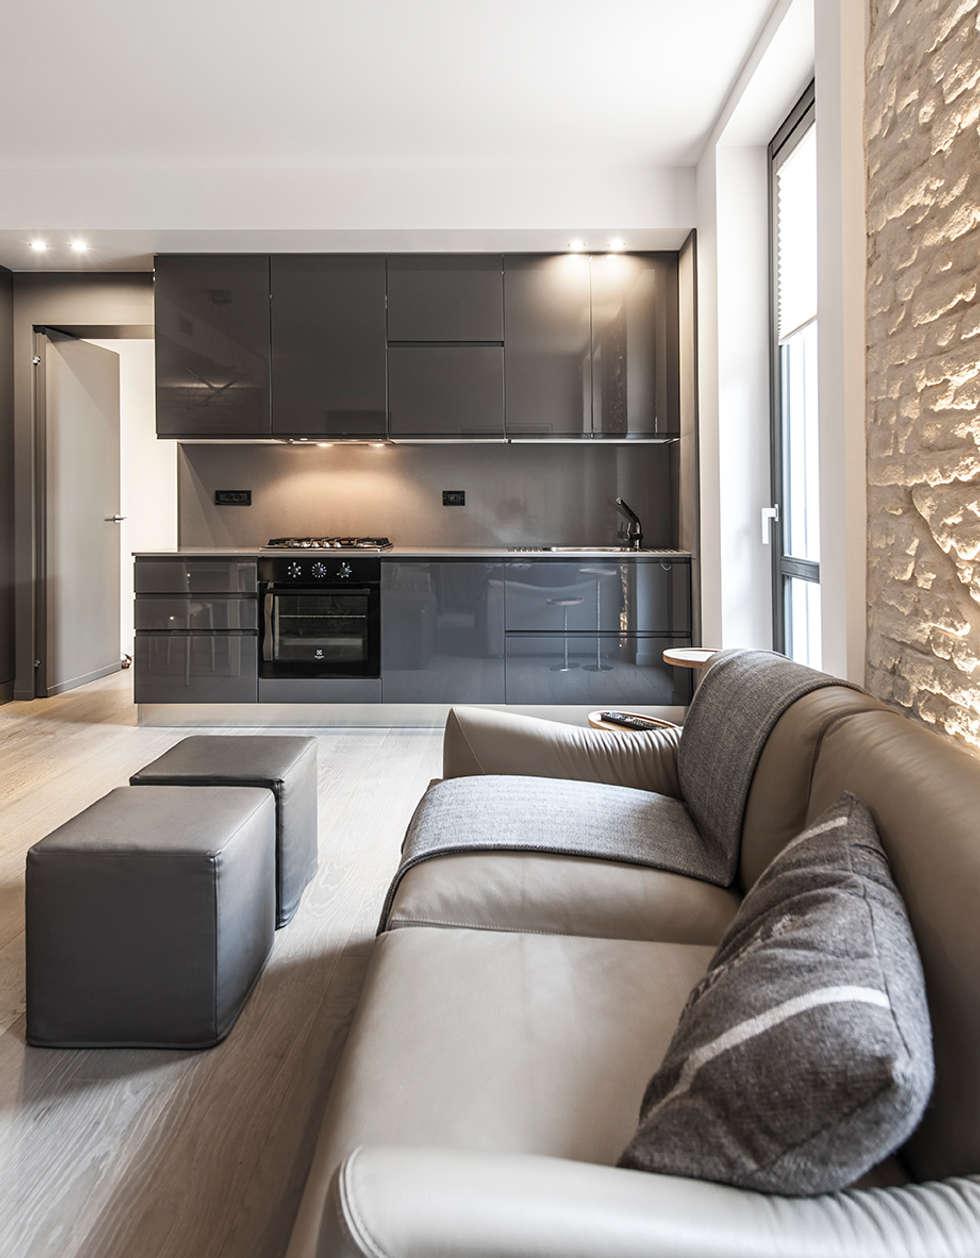 Quadri Cucina Moderna. Stunning Quadri Per Cucina La Mia Cucina ...